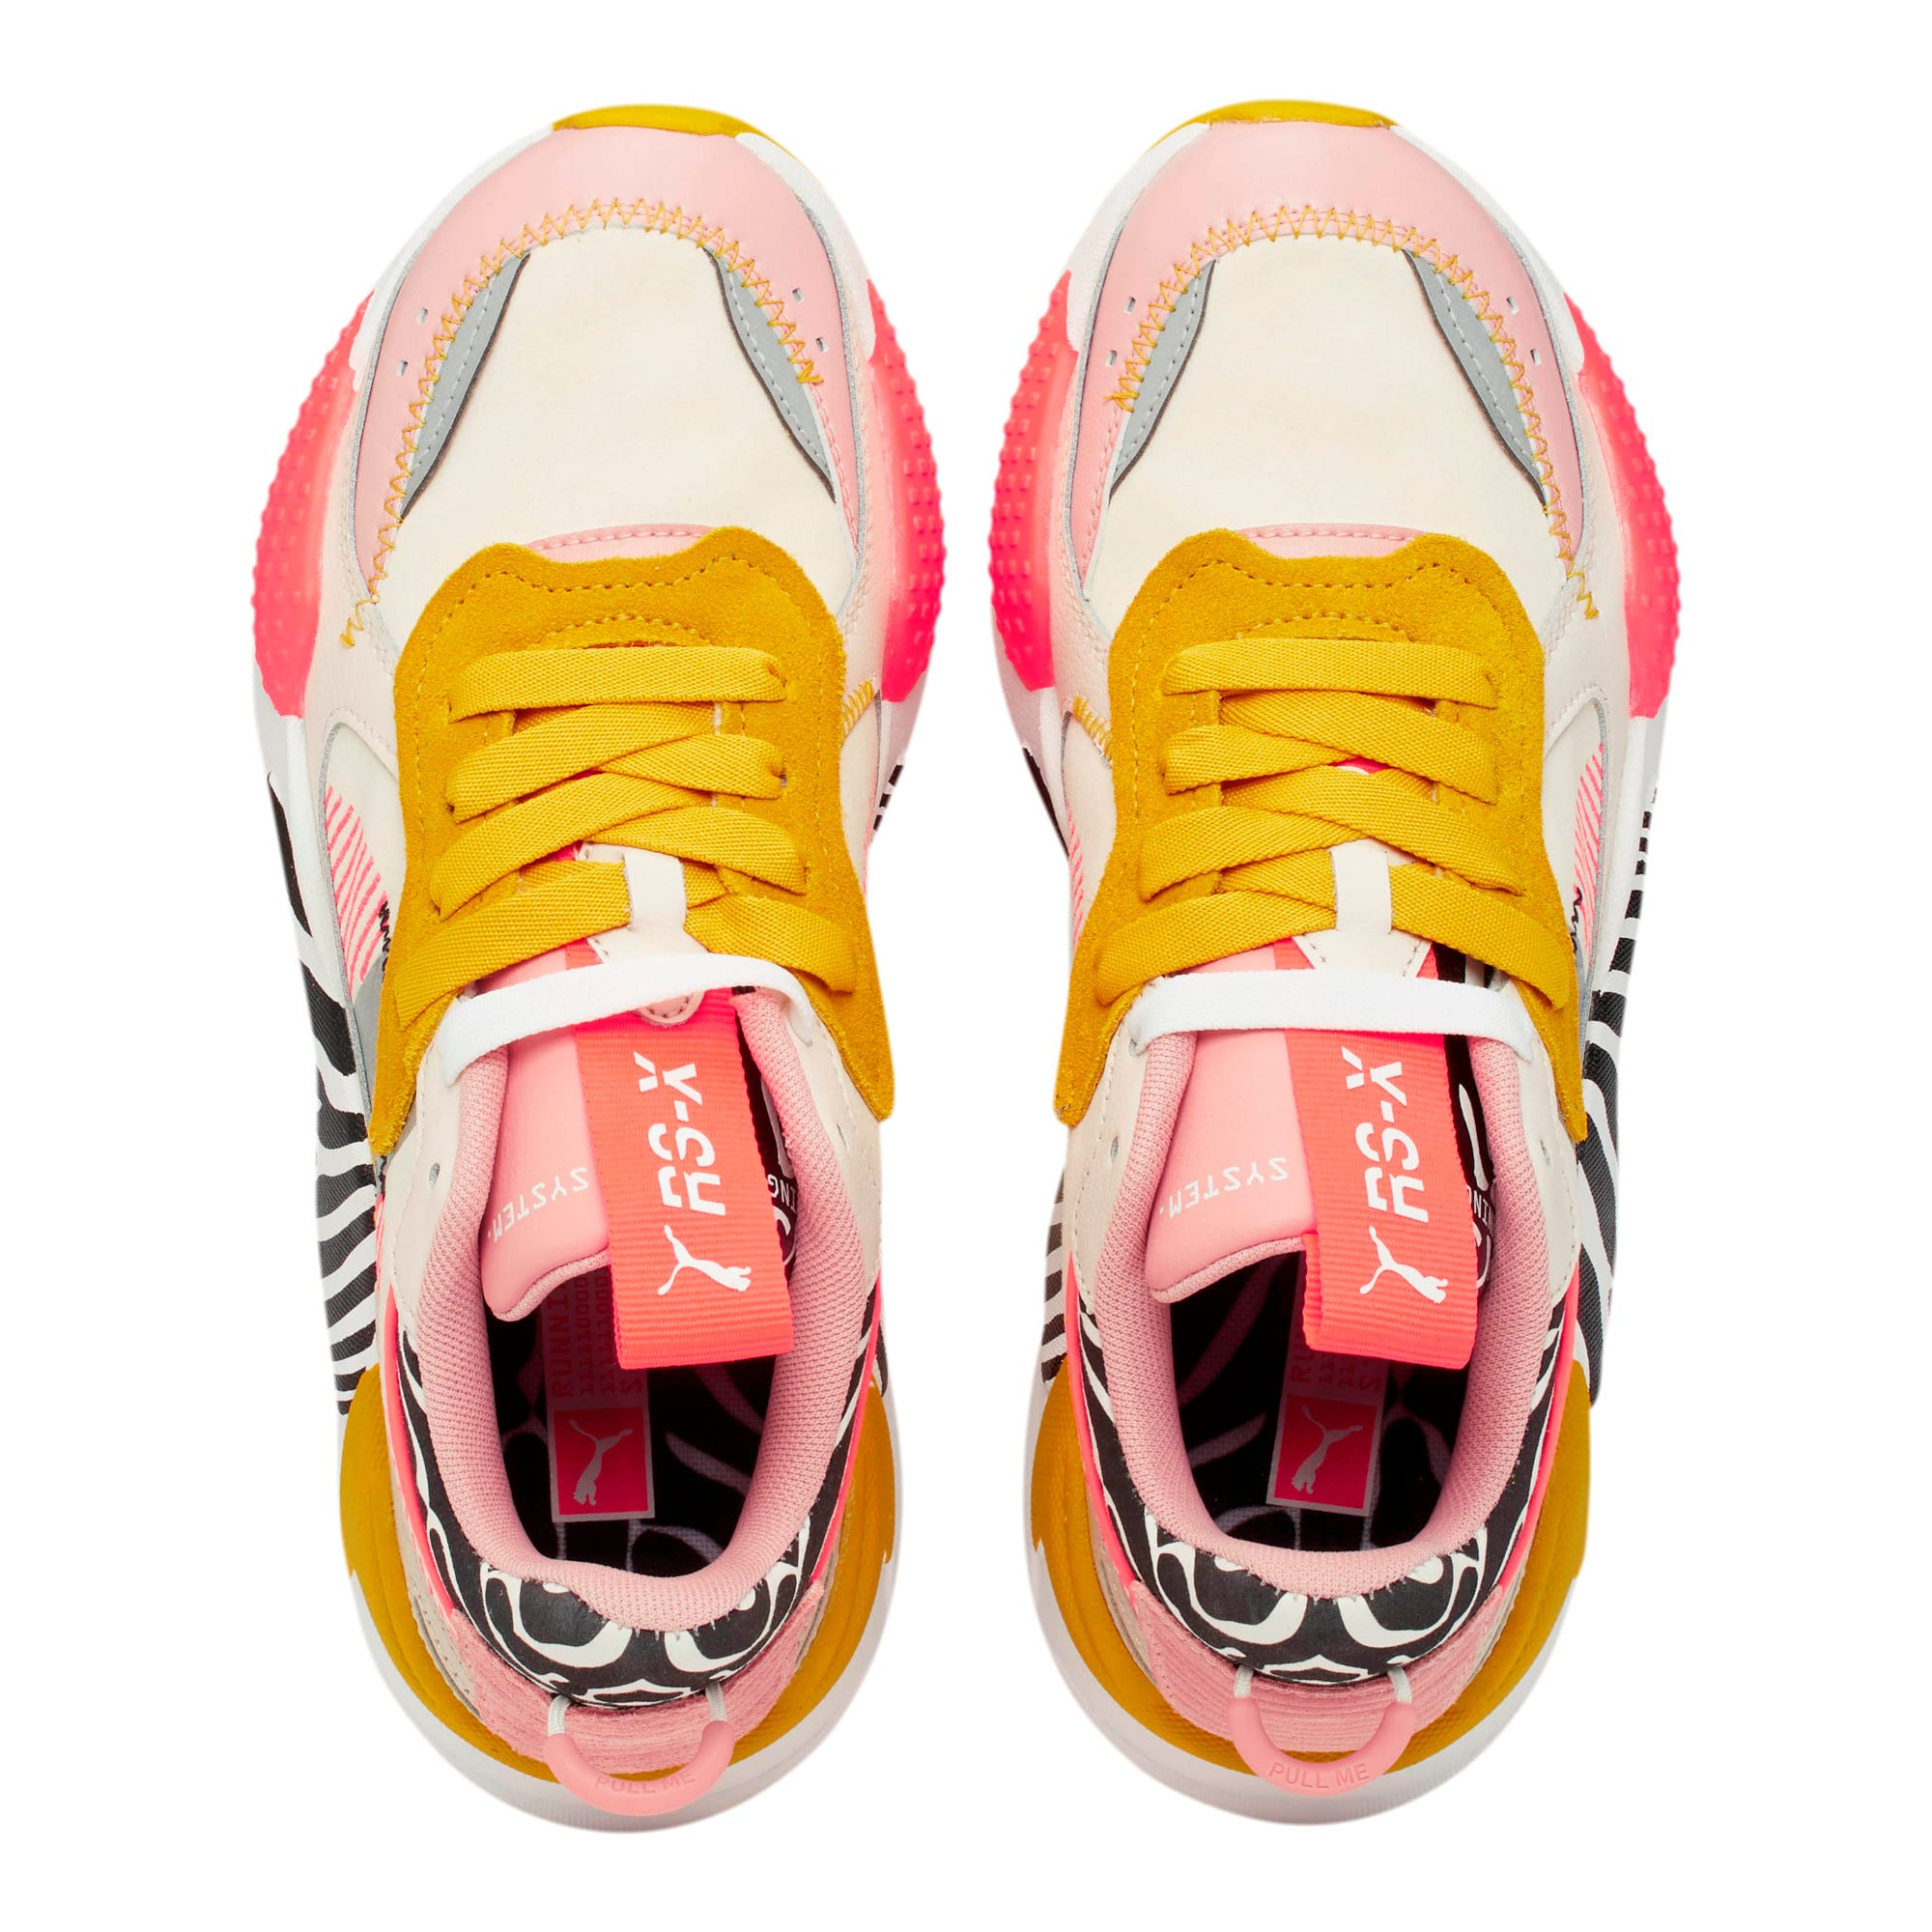 Thumbnail 5 of RS-X Unexpected Mixes Women's Sneakers, Pastel-Bridal Rose-Sulphur, medium